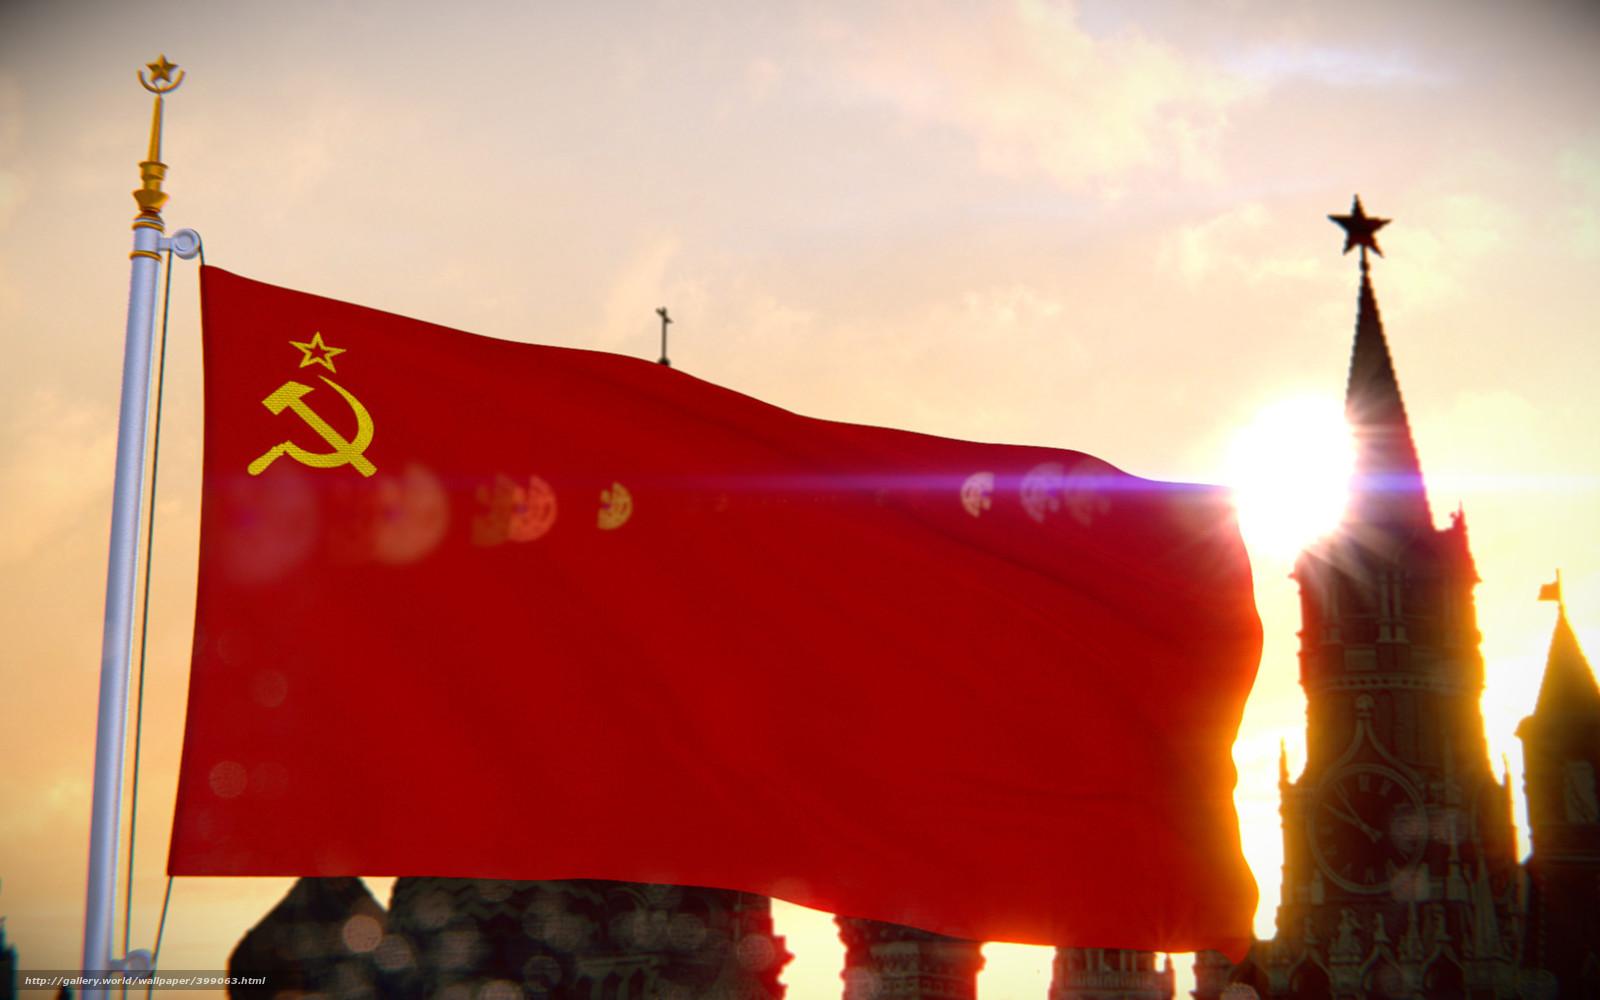 http://st.gdefon.com/wallpapers_original/s/399063_moskva_budushhee_socializm_kommunizm_dvizhenie_sut_1920x1200_(www.GdeFon.ru).jpg